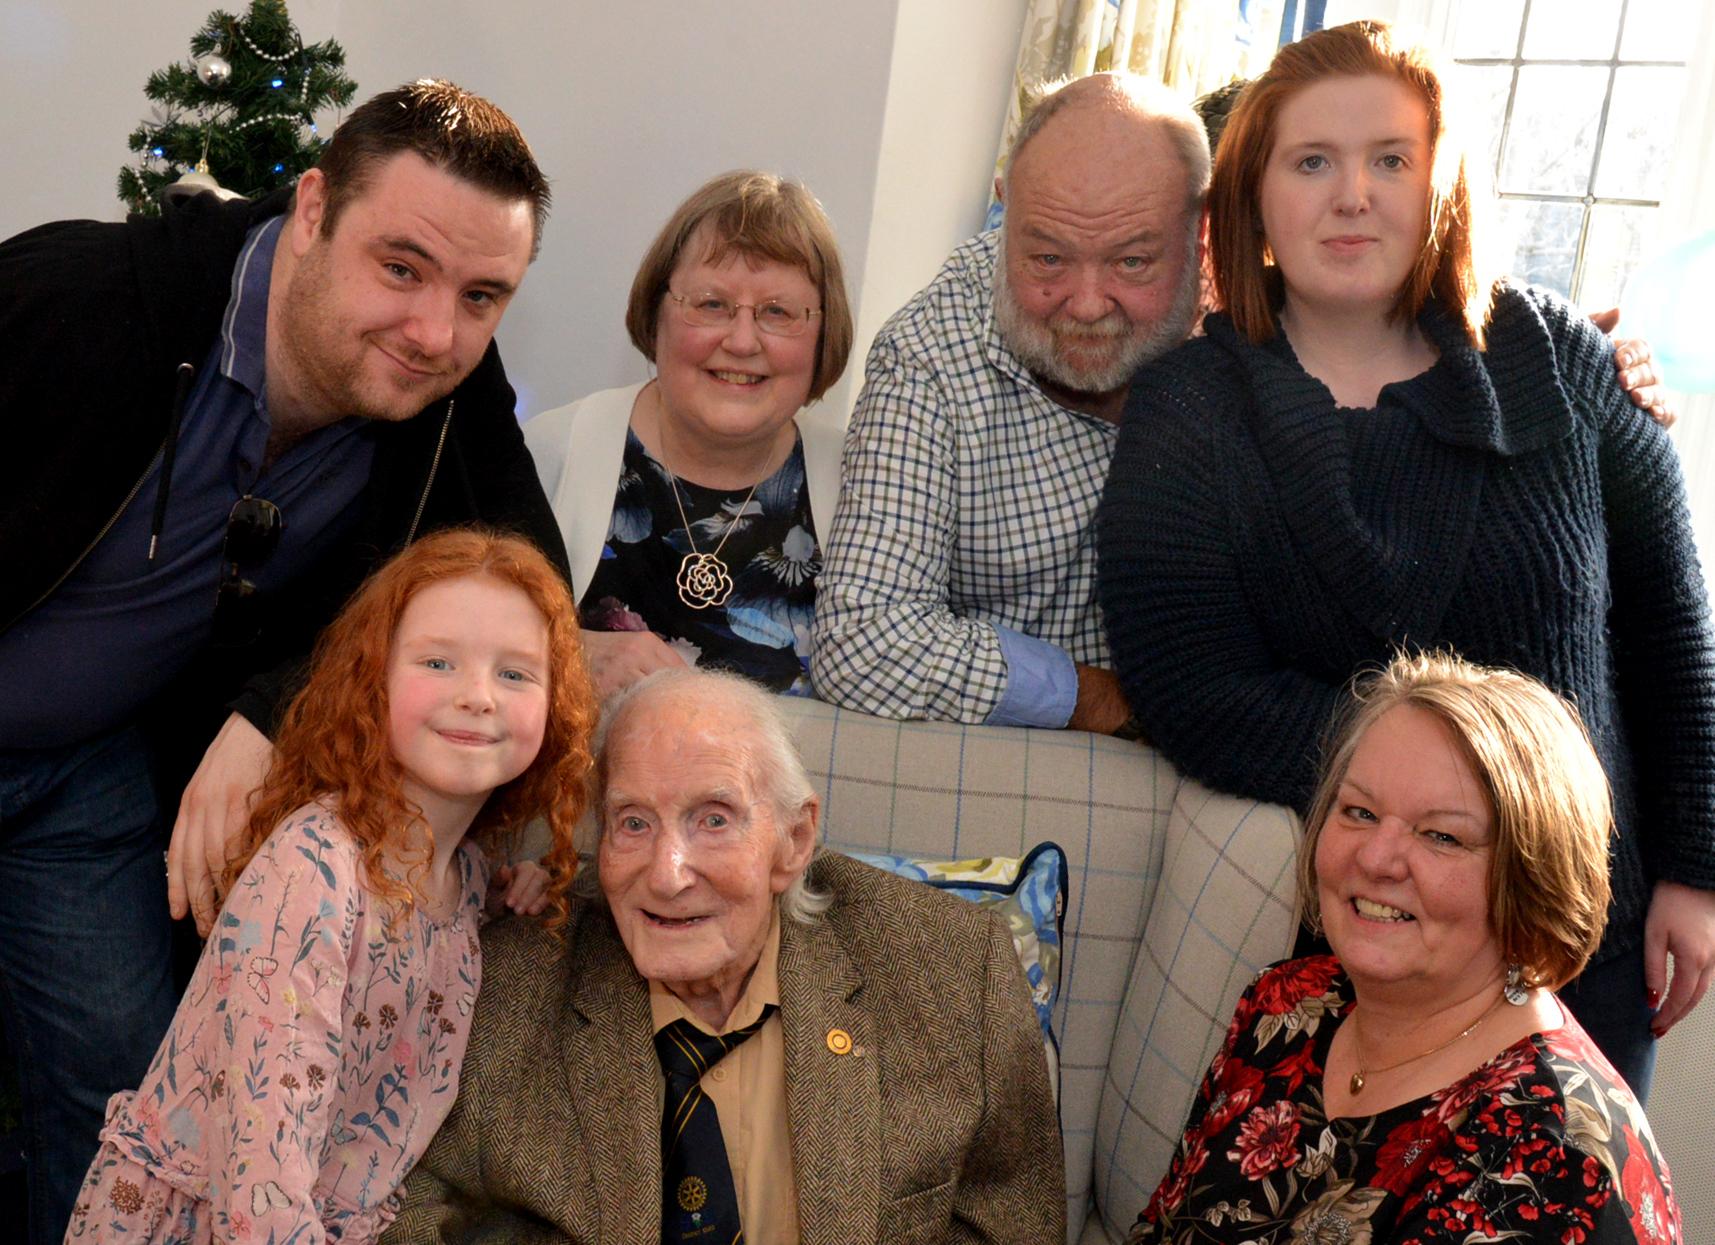 Tom Greenwood, World War Two veteran, dies aged 100